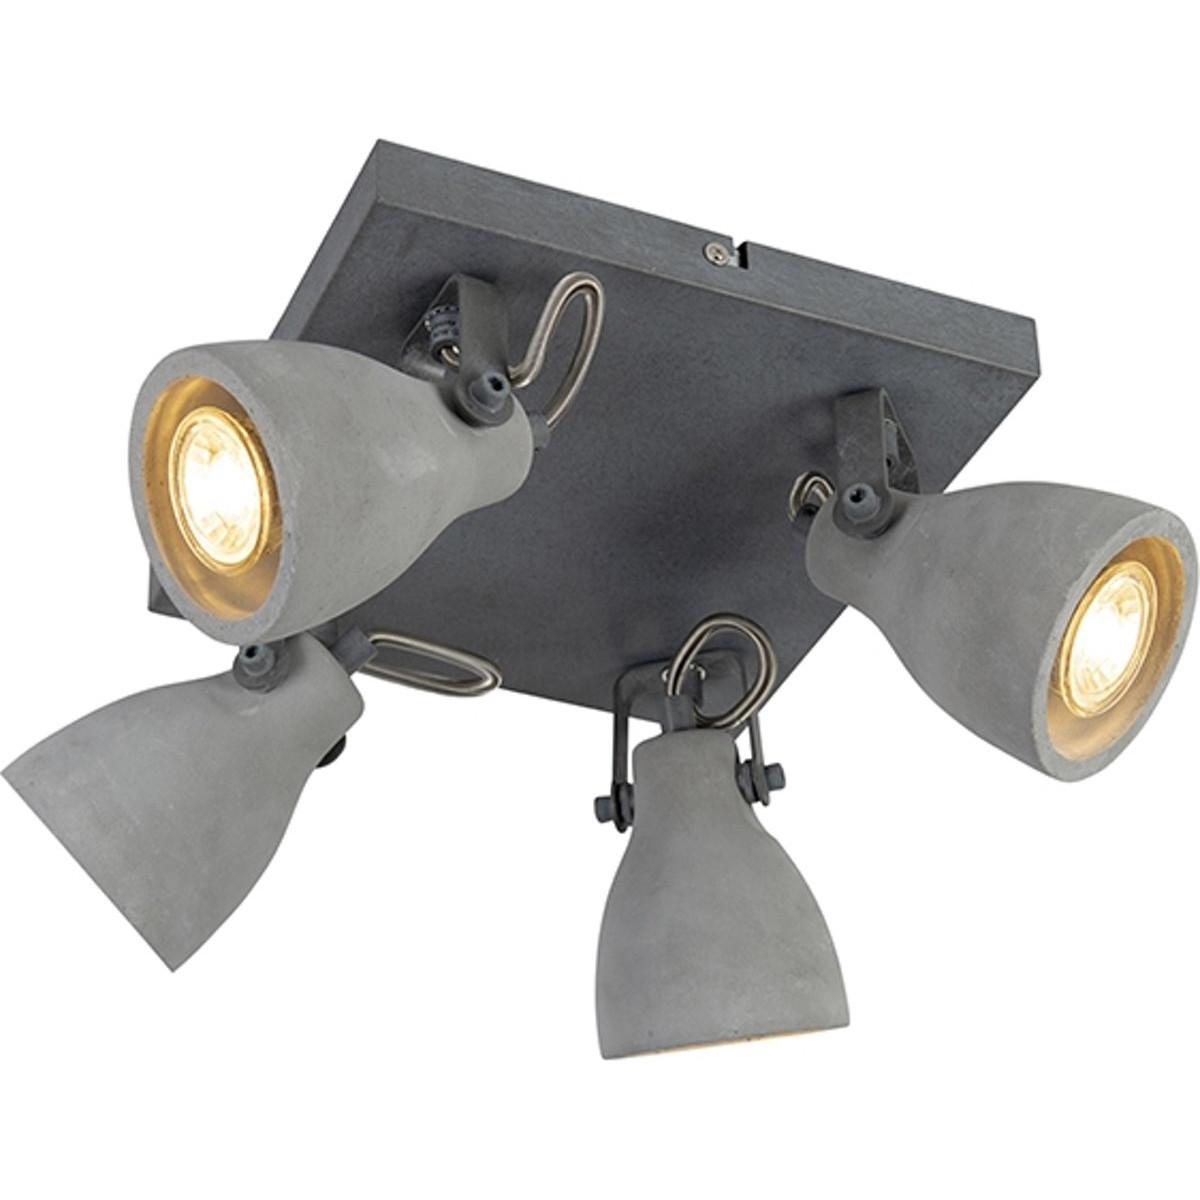 LED Plafondspot - Trion Conry - GU10 Fitting - 4-lichts - Vierkant - Mat Grijs Beton Look - Aluminiu